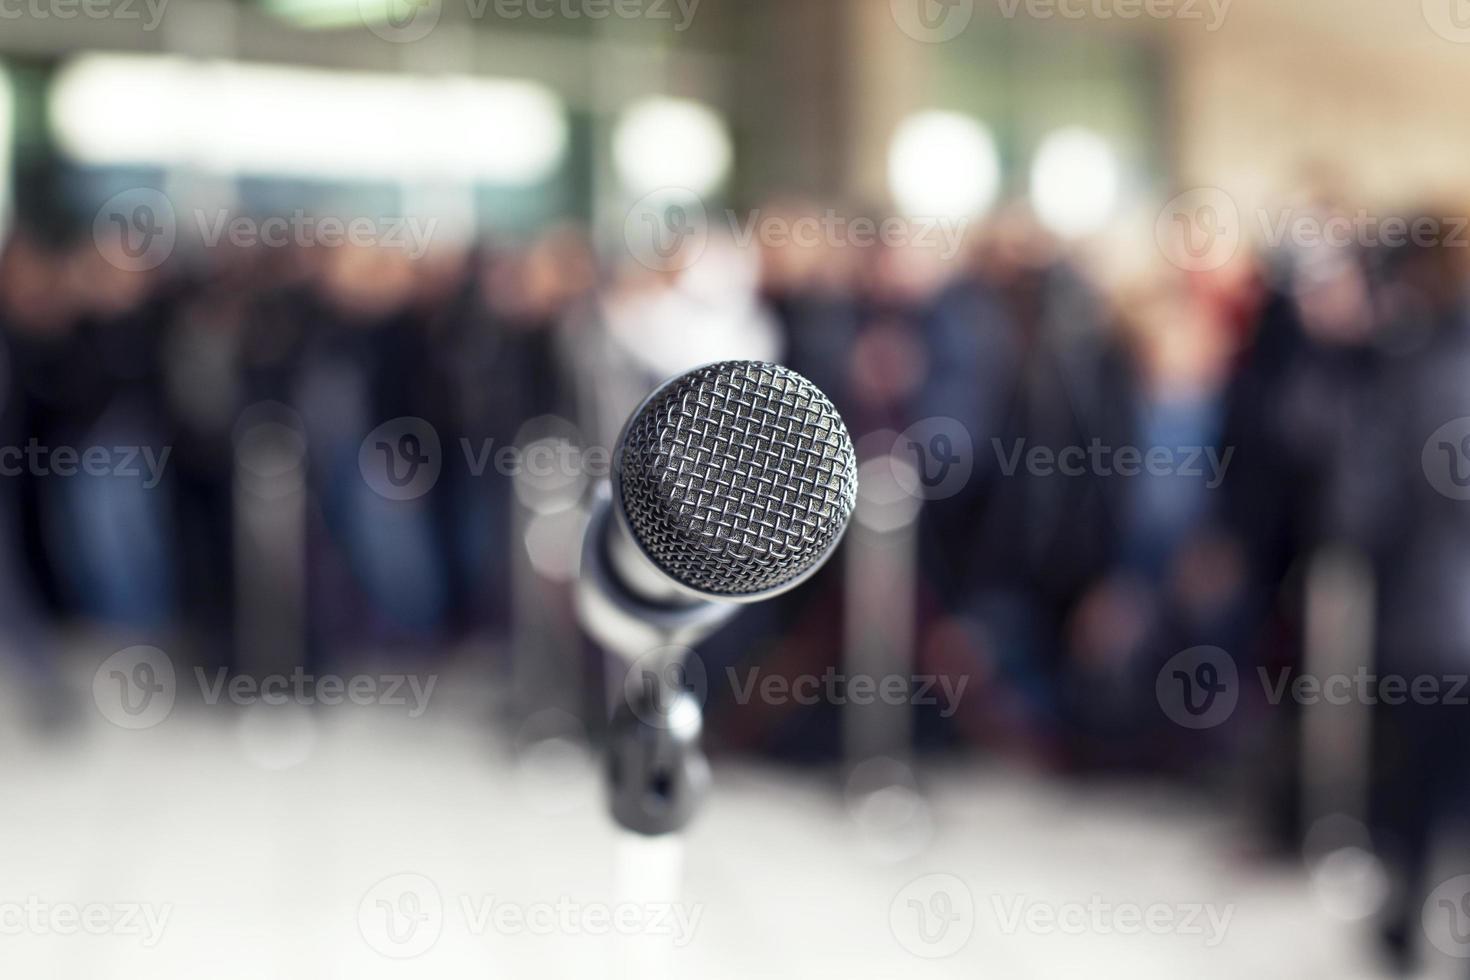 Press conference photo